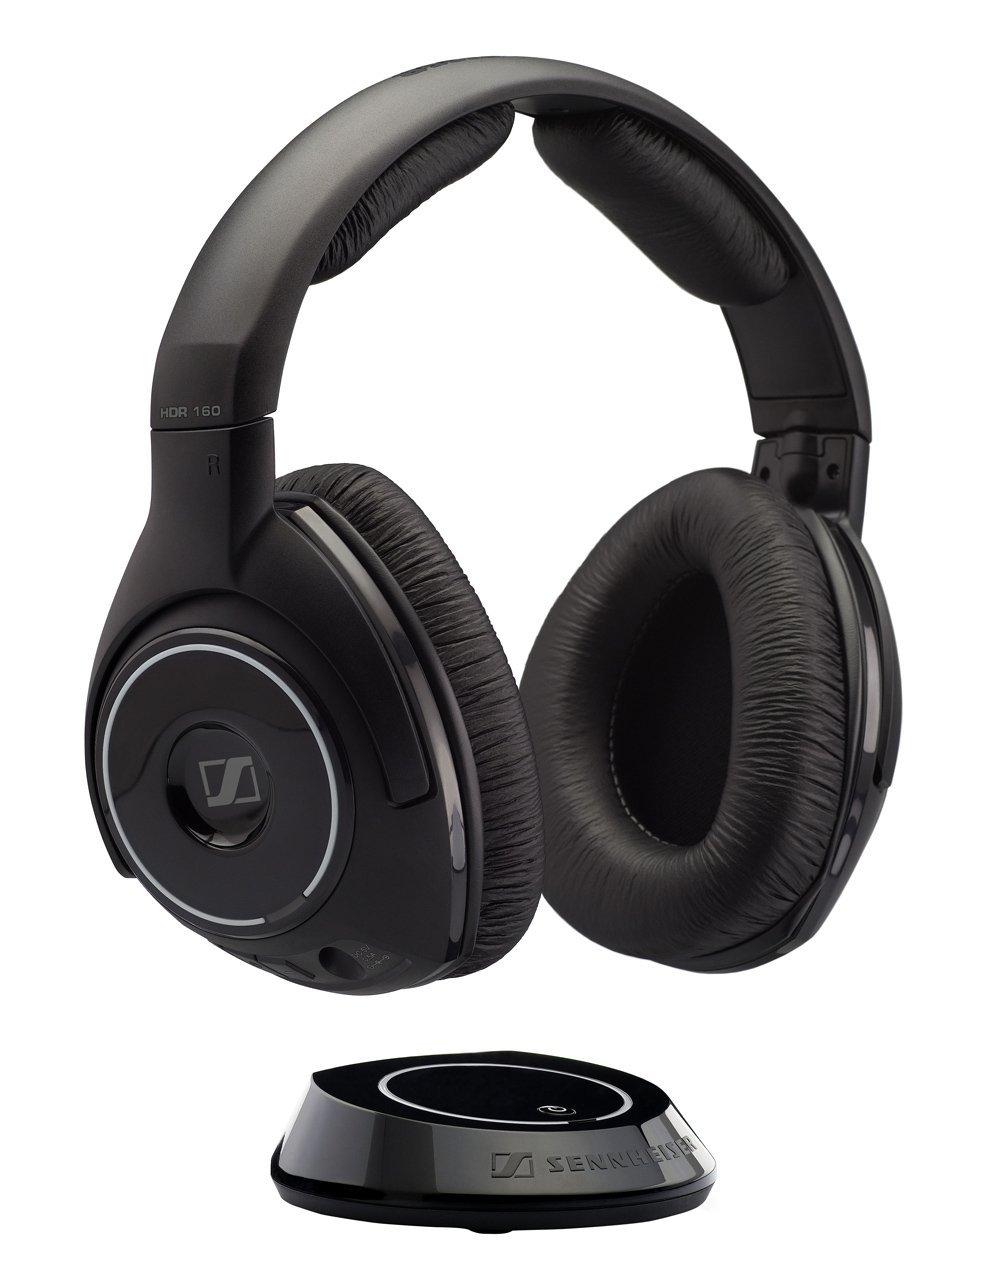 Bluetooth Headsets,eBay.com